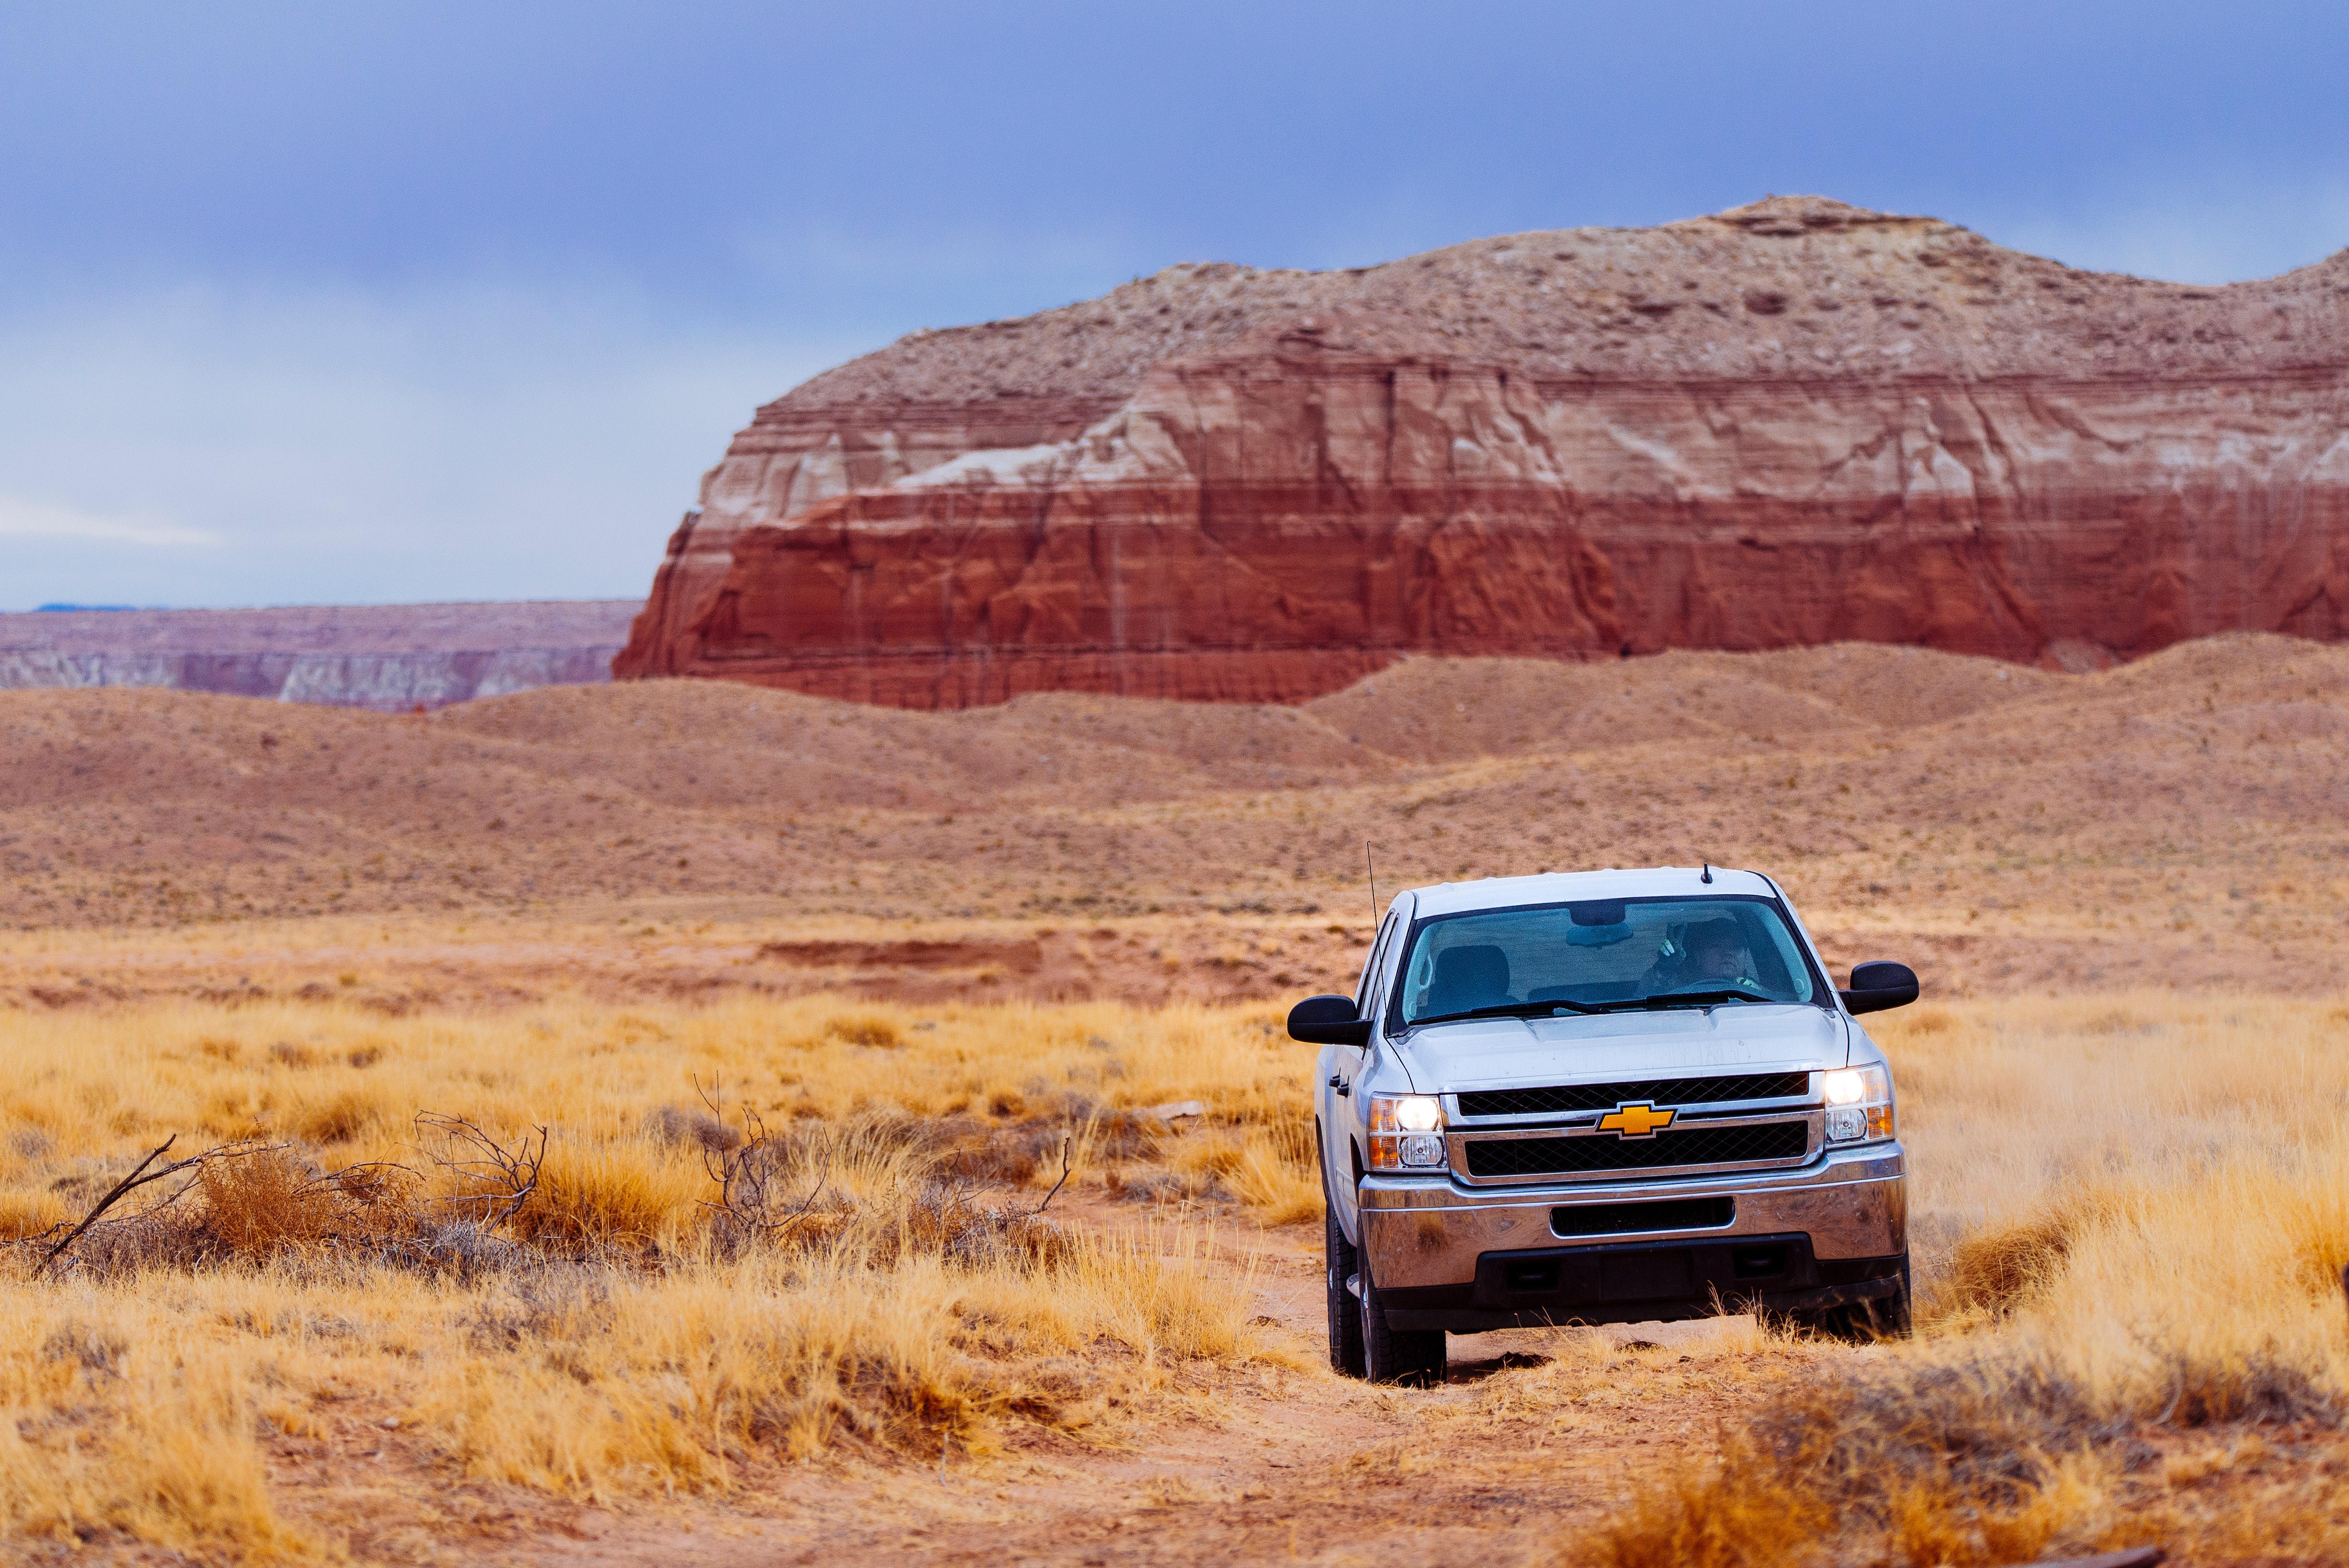 White Chevrolet Vehicle on Dessert, Adventure, Headlights, Scenic, Park, HQ Photo